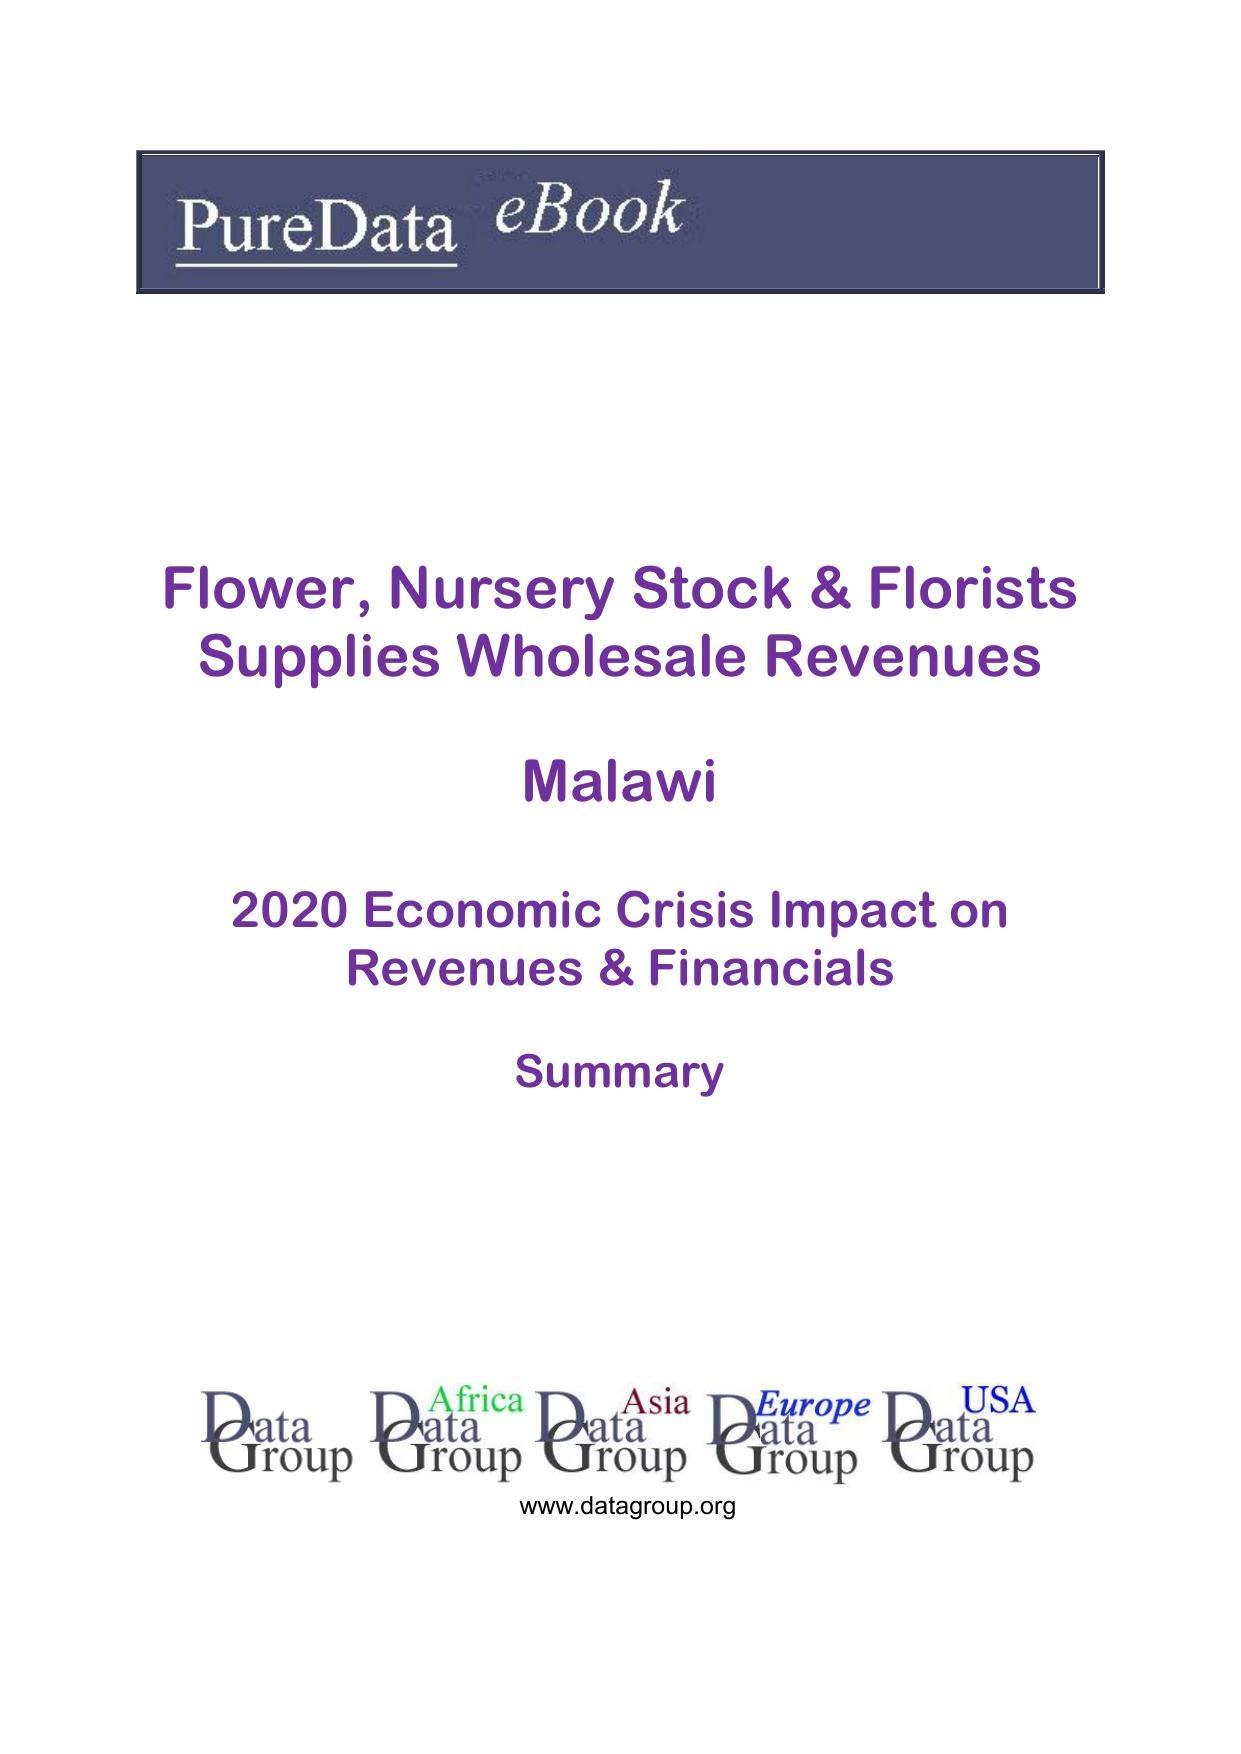 Flower, Nursery Stock & Florists Supplies Wholesale Revenues Malawi Summary: 2020 Economic Crisis Impact on Revenues & Financials